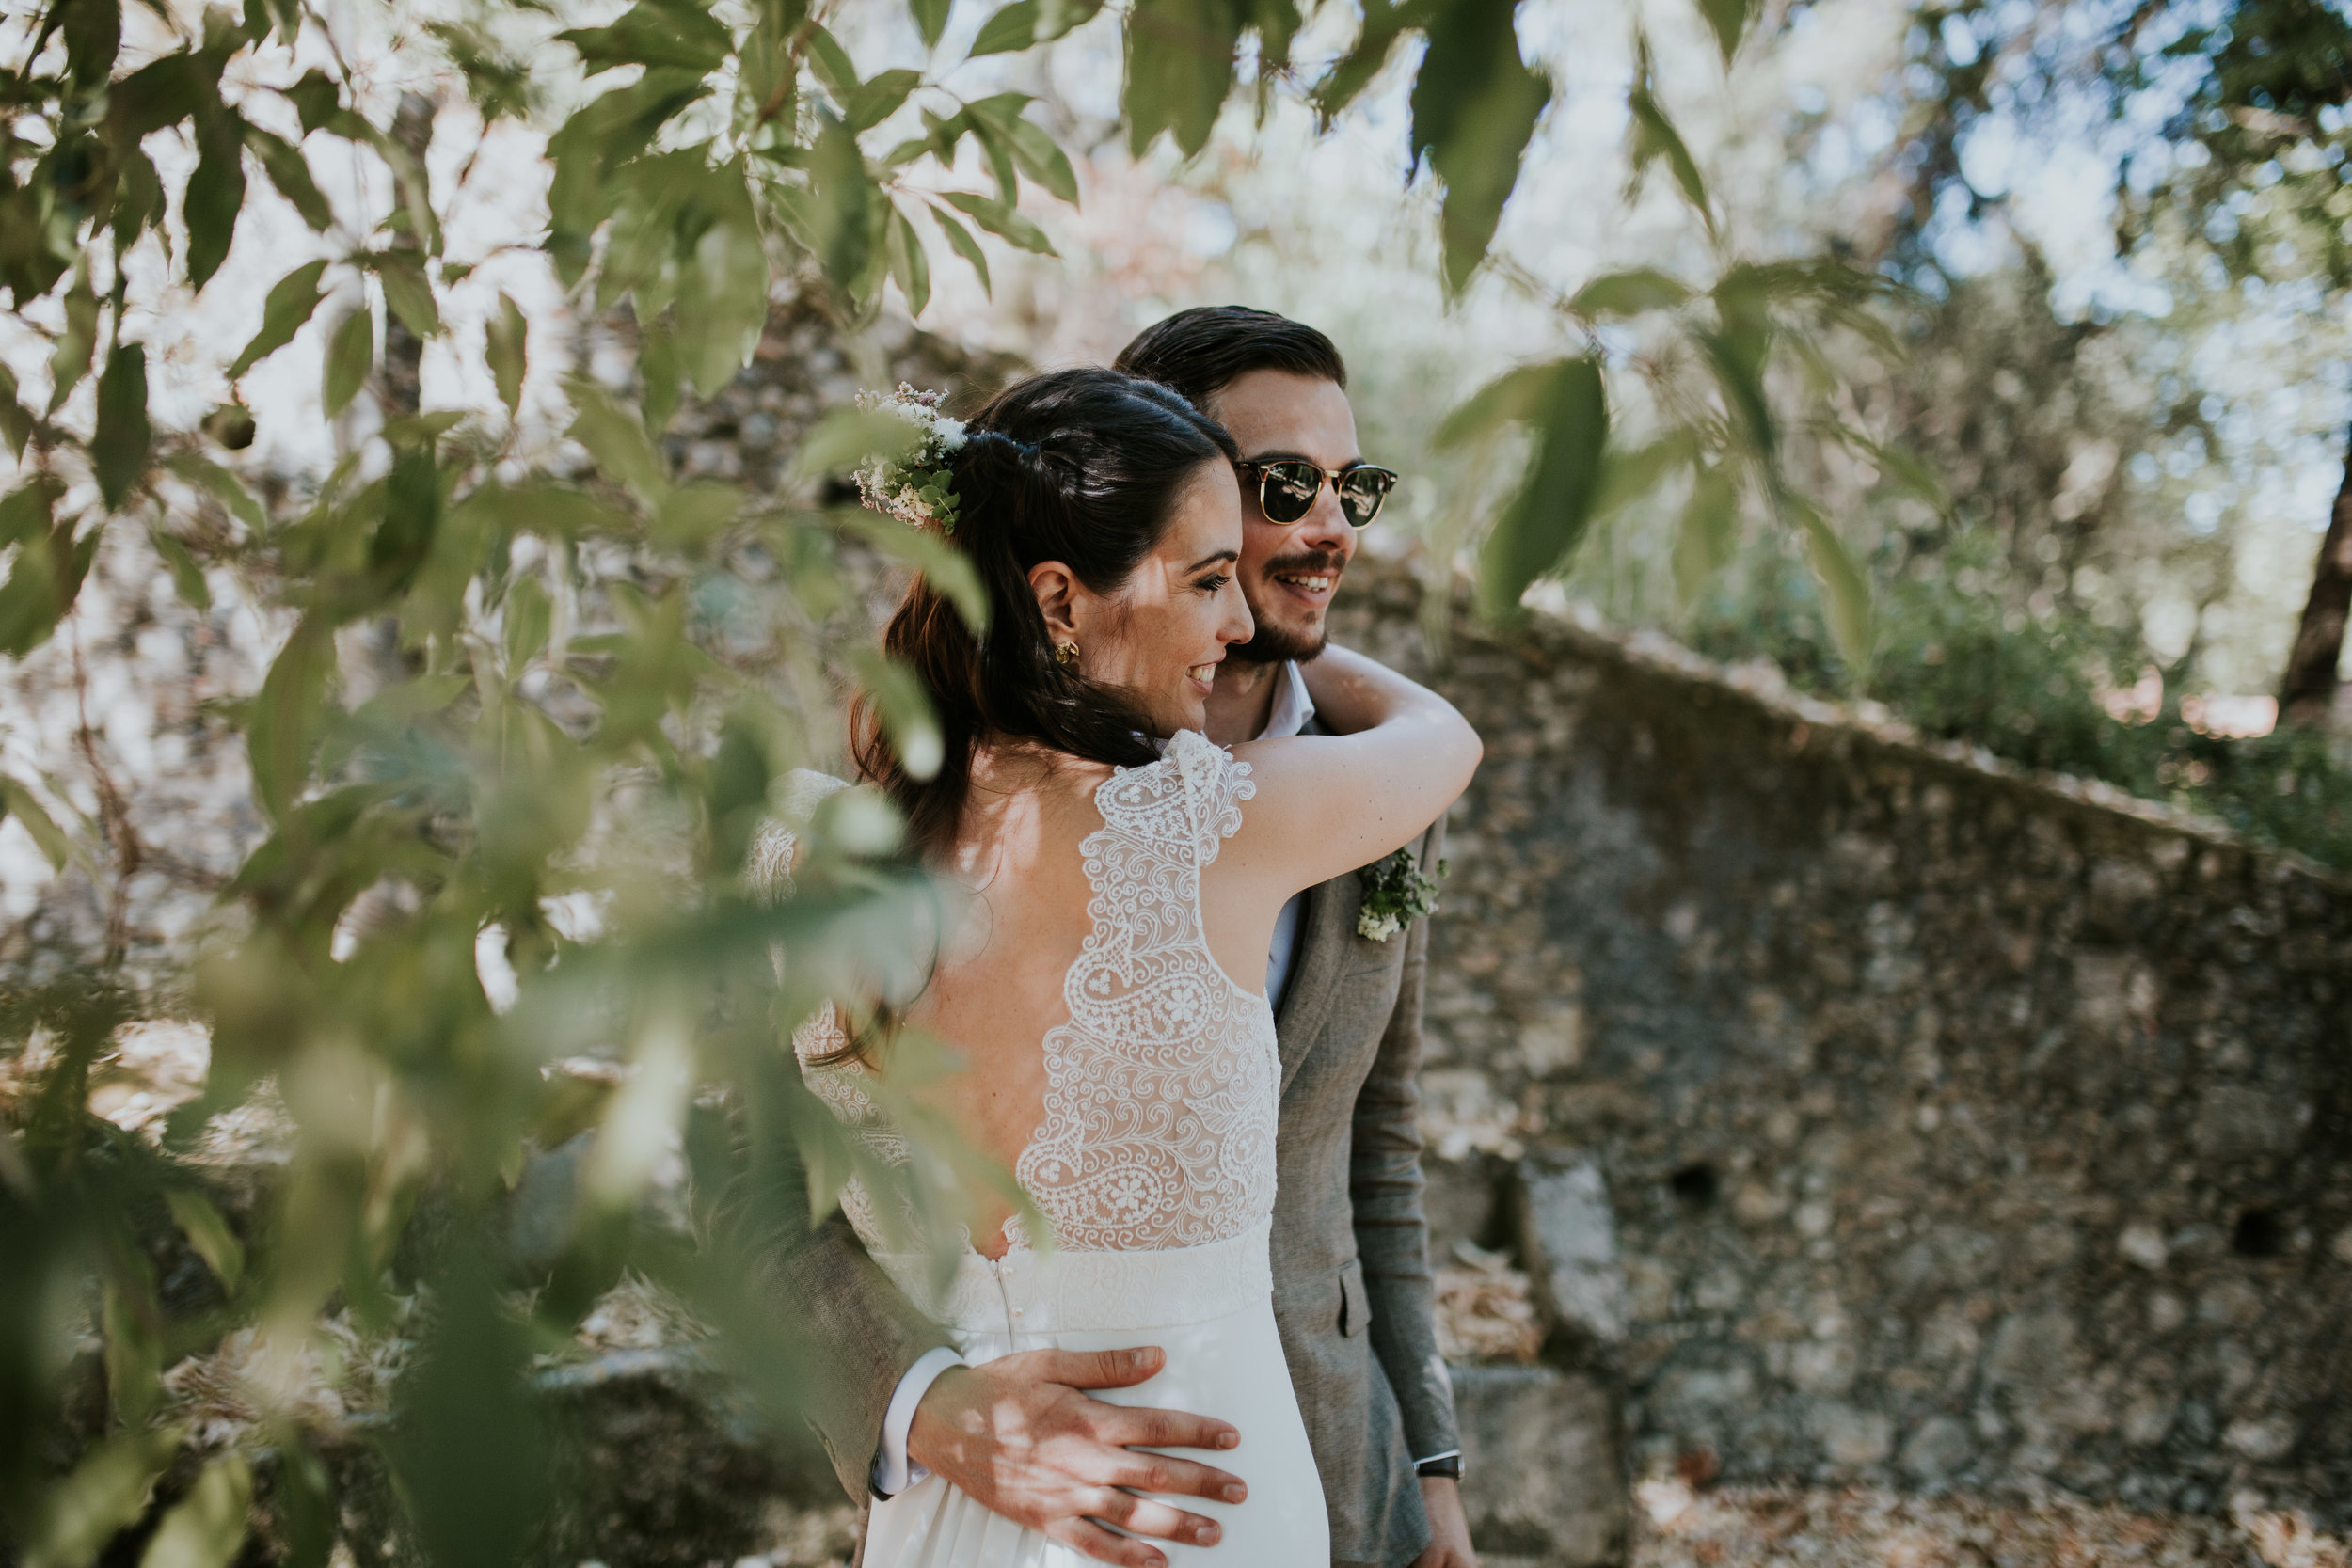 J&P 508_ 02 setembro 2017 Wedding day_.jpg